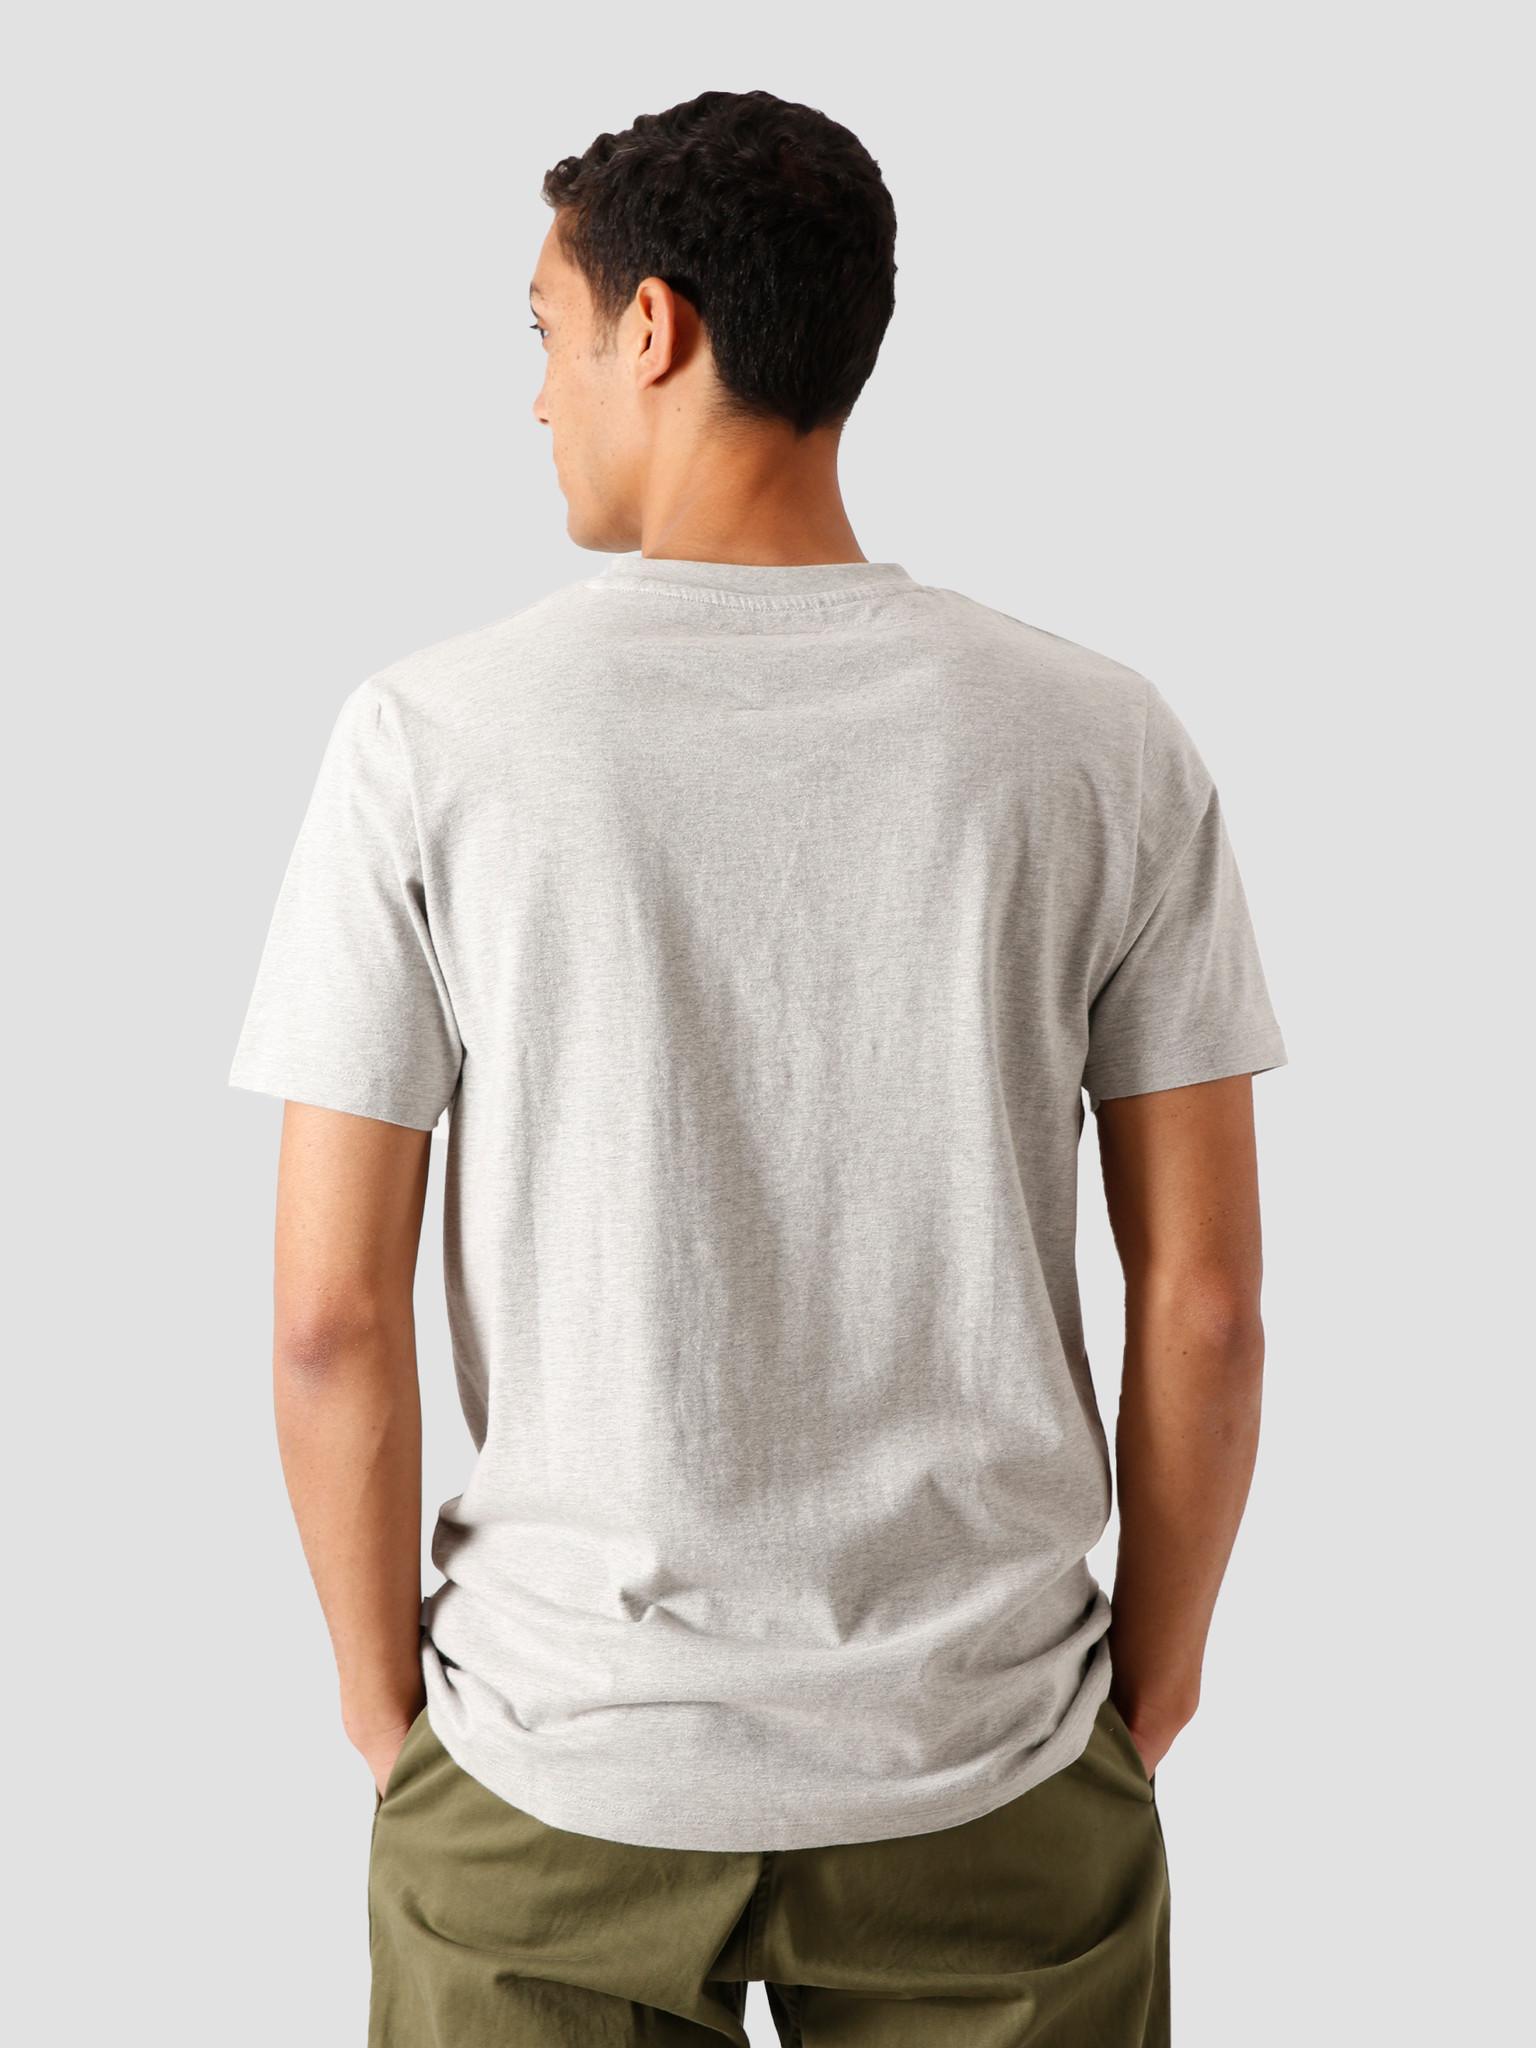 Quality Blanks Quality Blanks QB03 Patch Logo T-Shirt Grey Heather